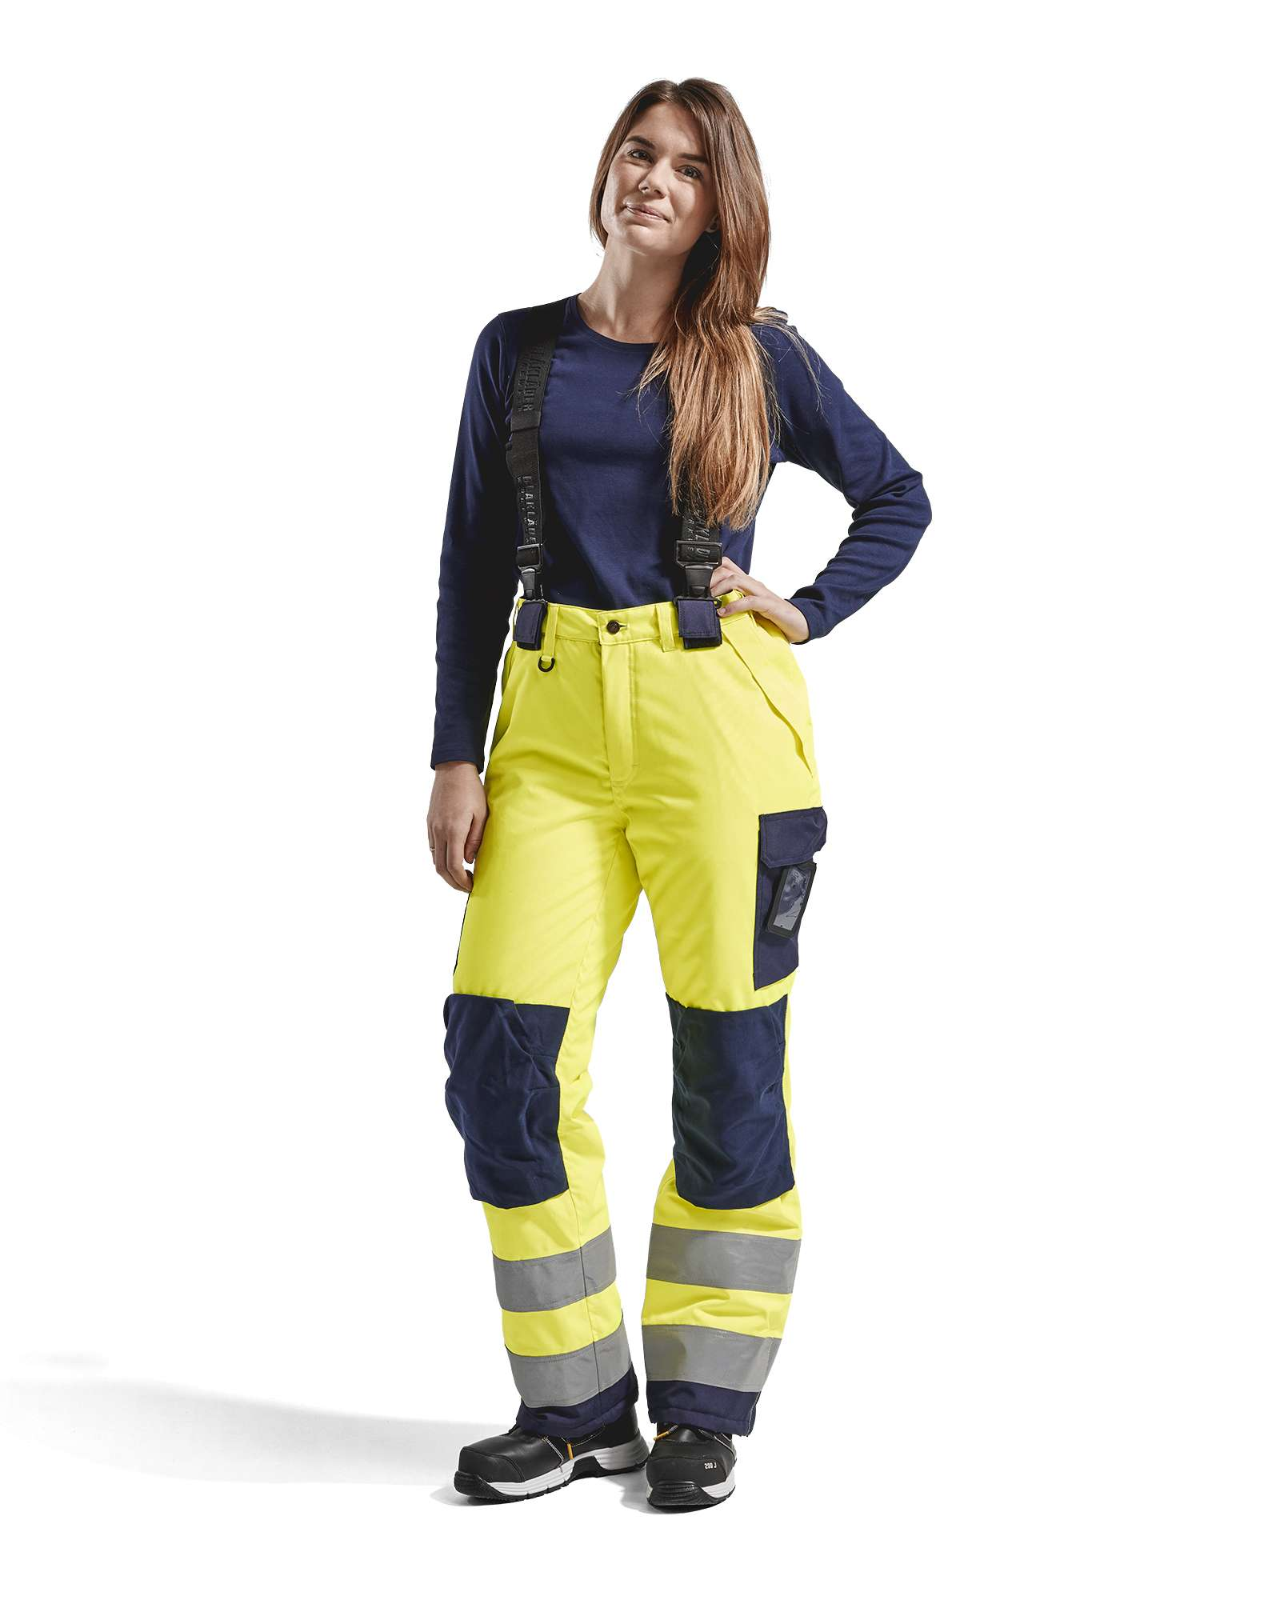 Blaklader Dames Winterbroeken 78851977 High Vis geel-marineblauw(3389)